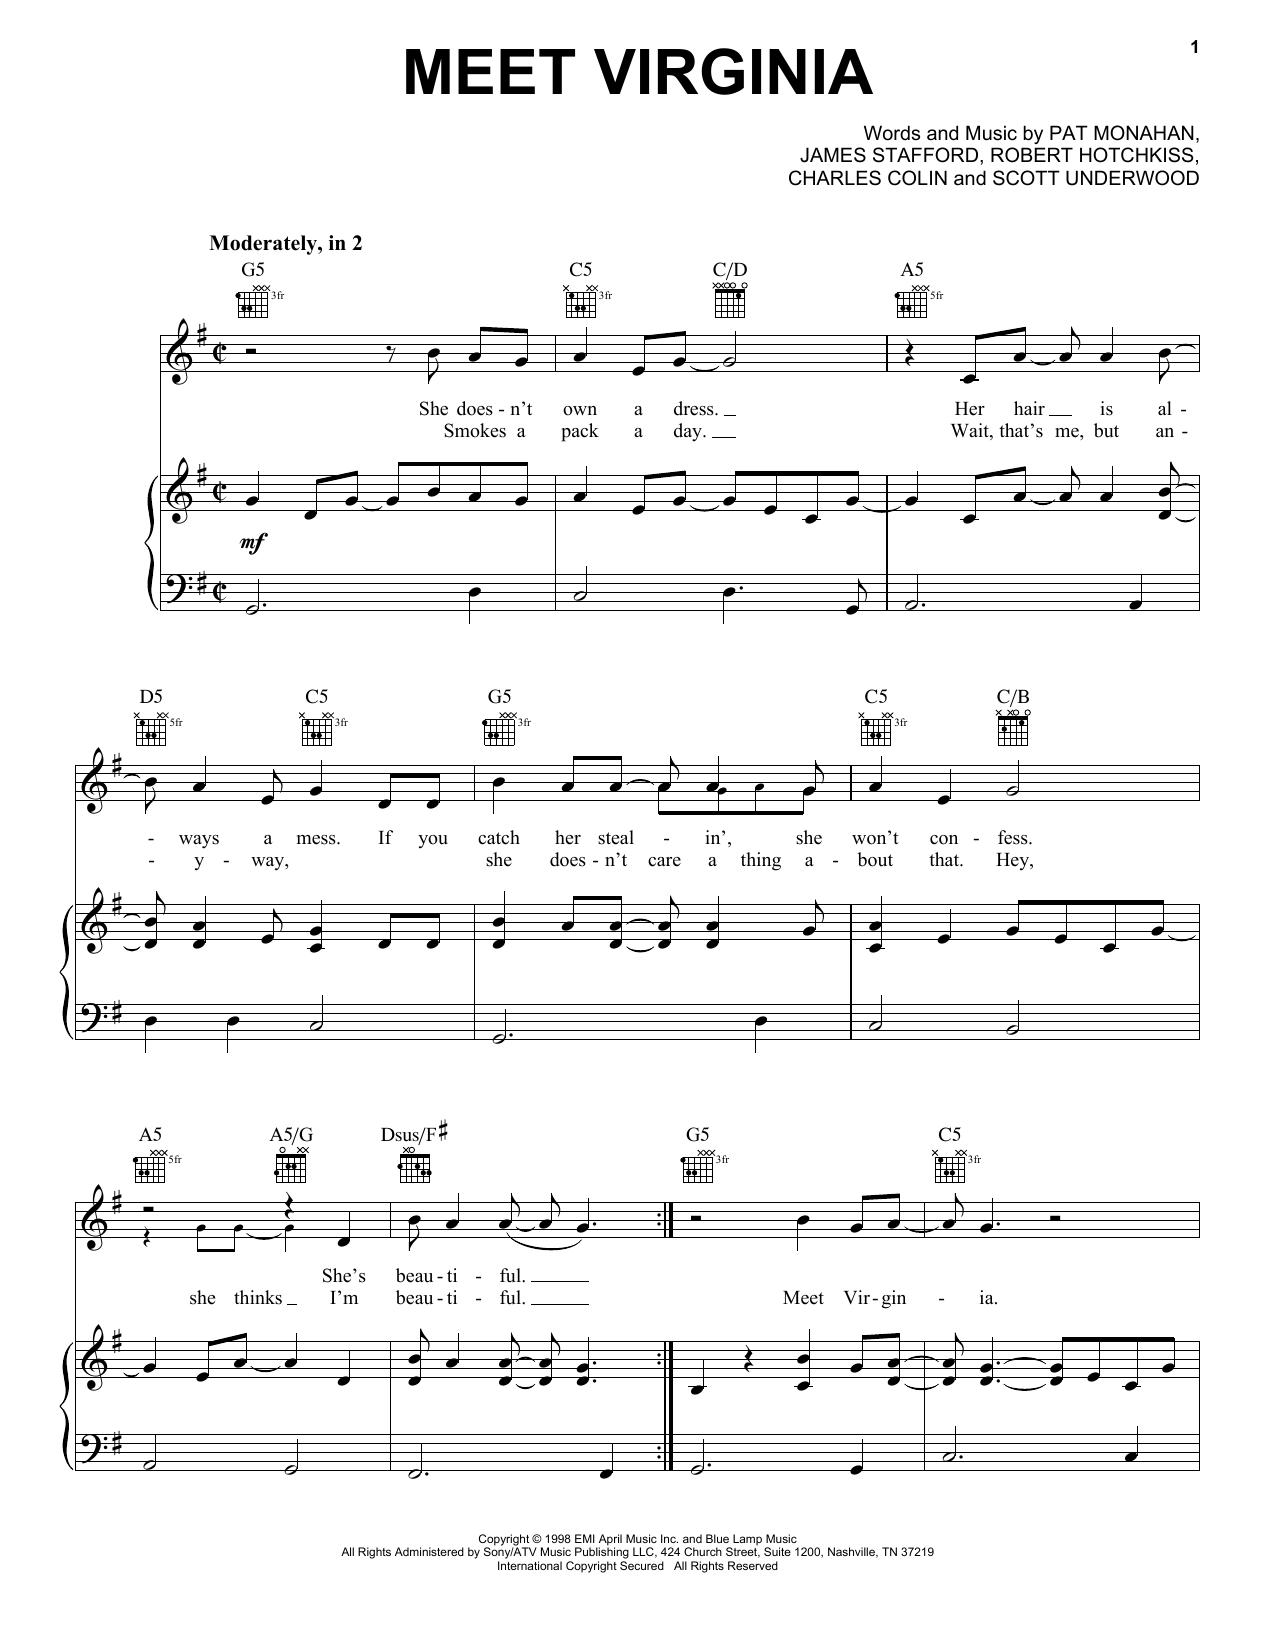 Train Meet Virginia sheet music notes and chords. Download Printable PDF.